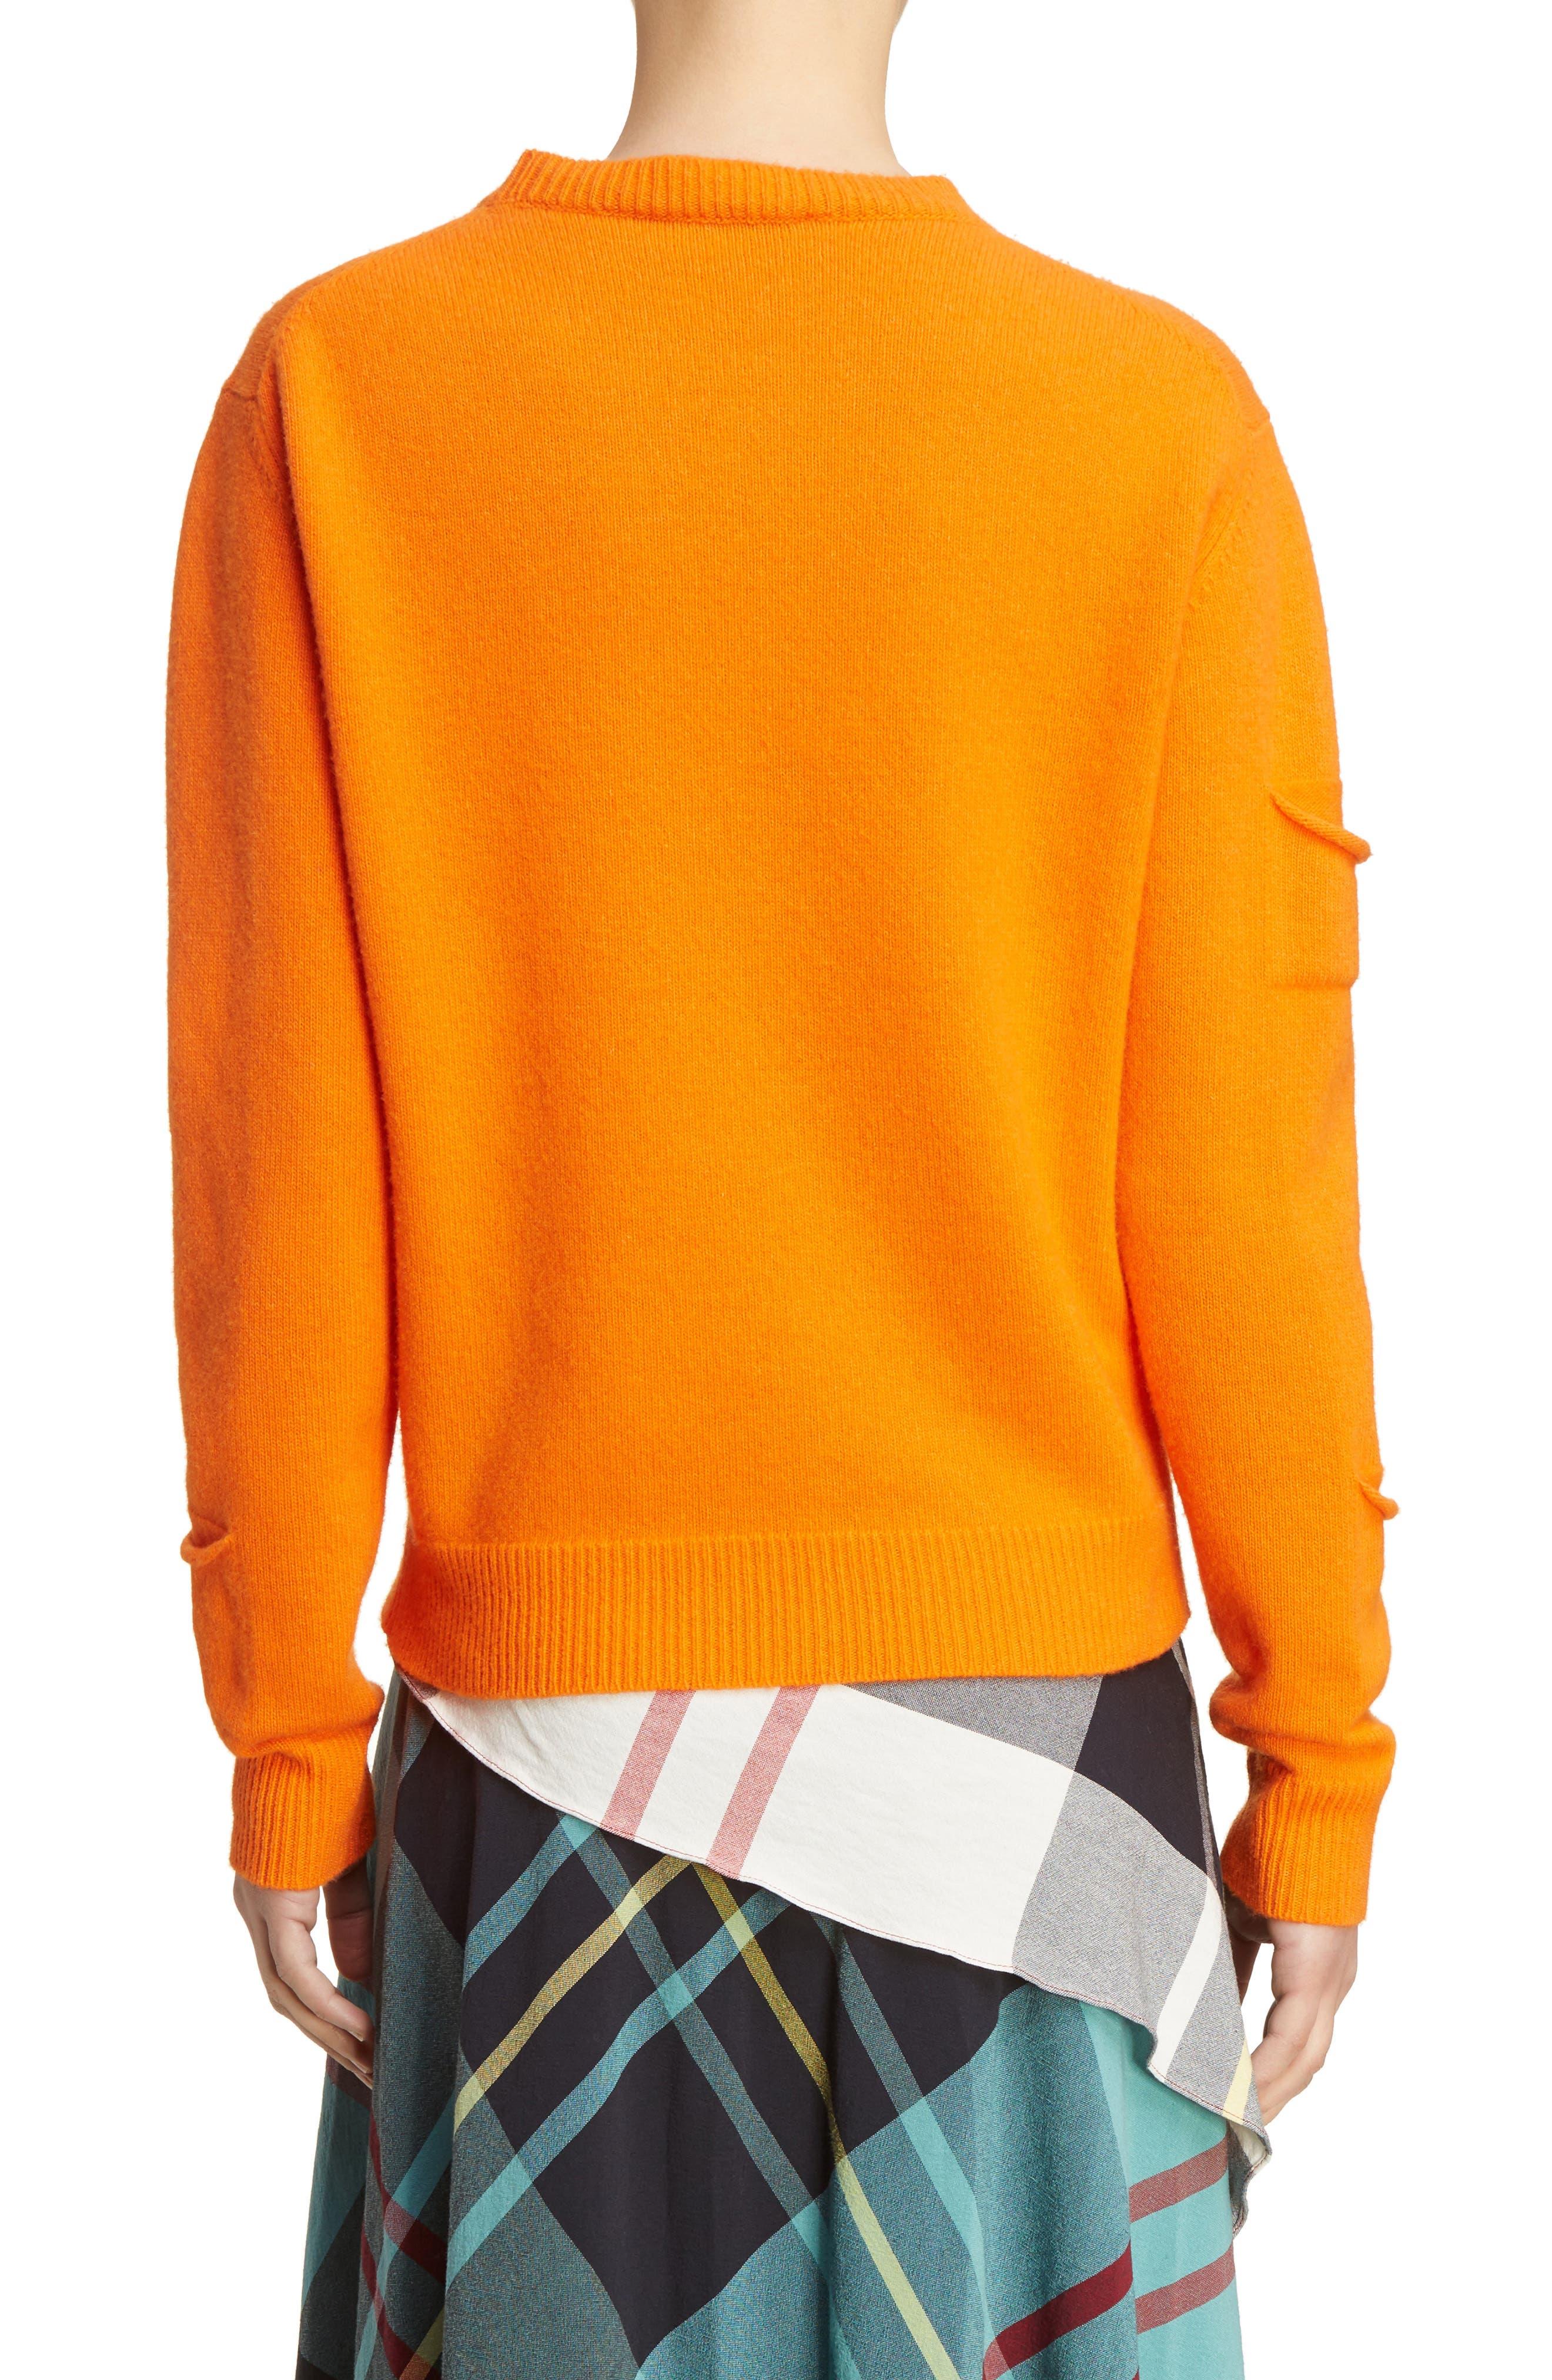 Alternate Image 2  - J.W.ANDERSON Multi Pocket Crewneck Sweater